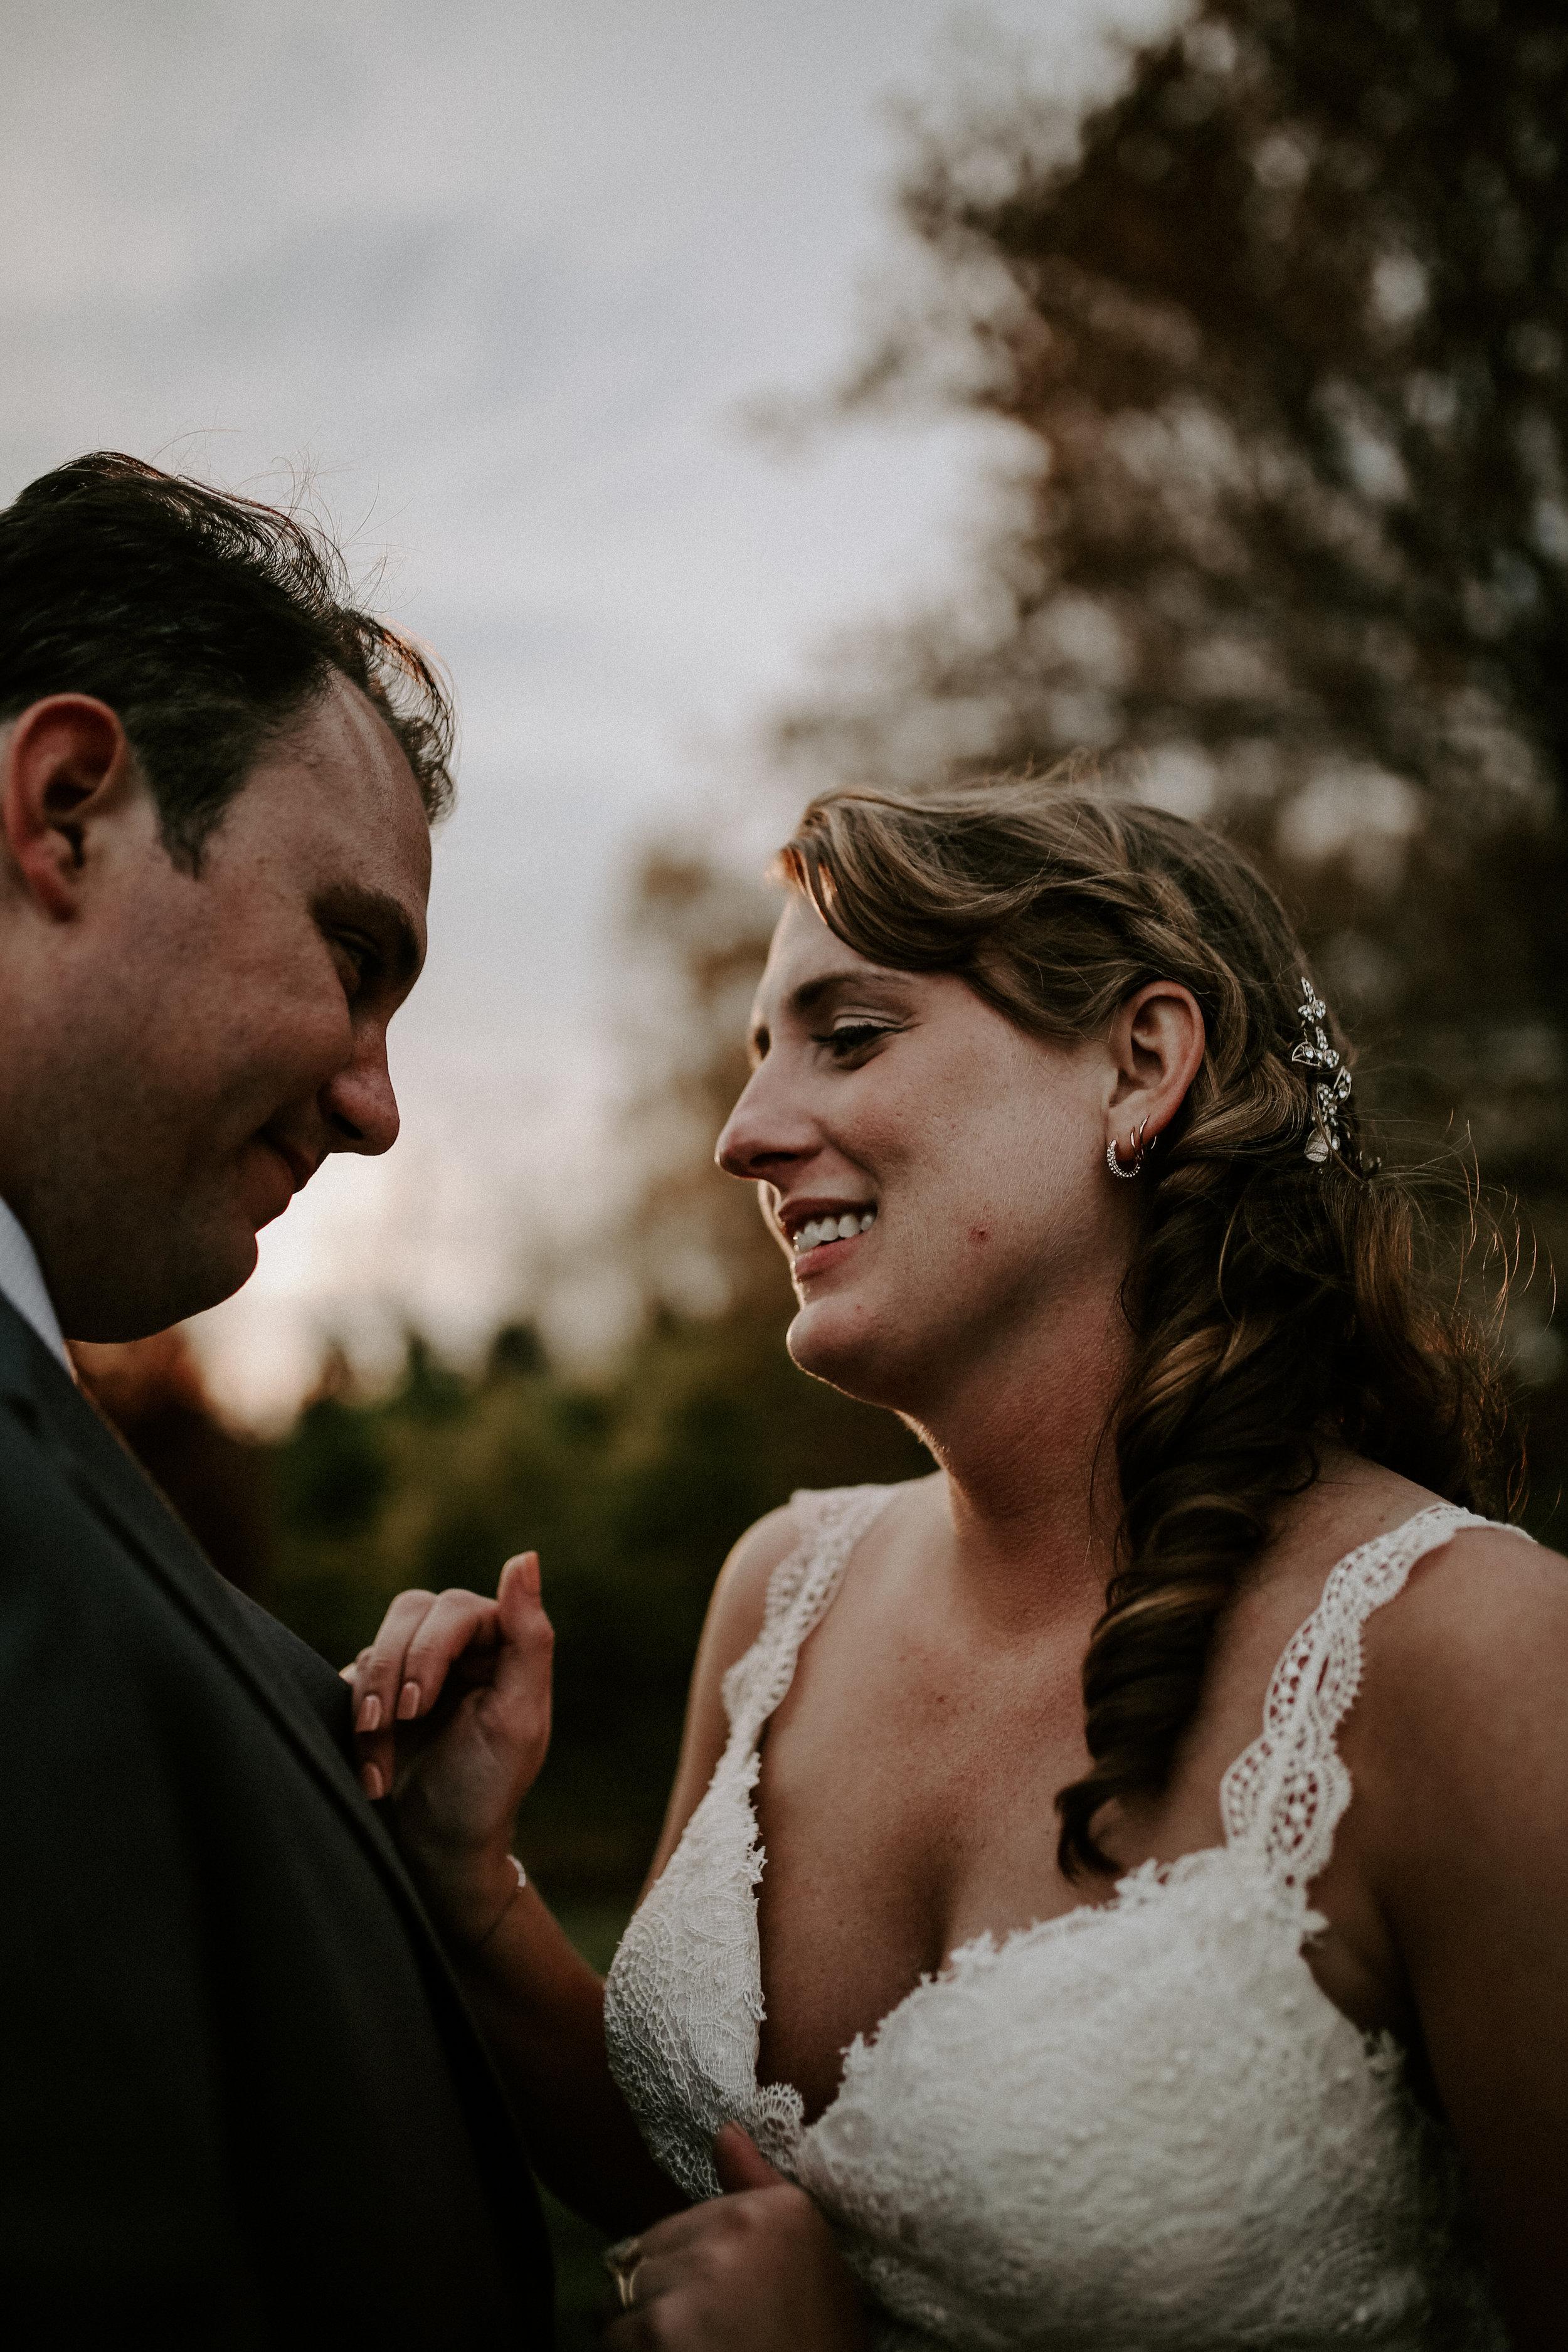 TheGreens_Married_2019-519.jpg